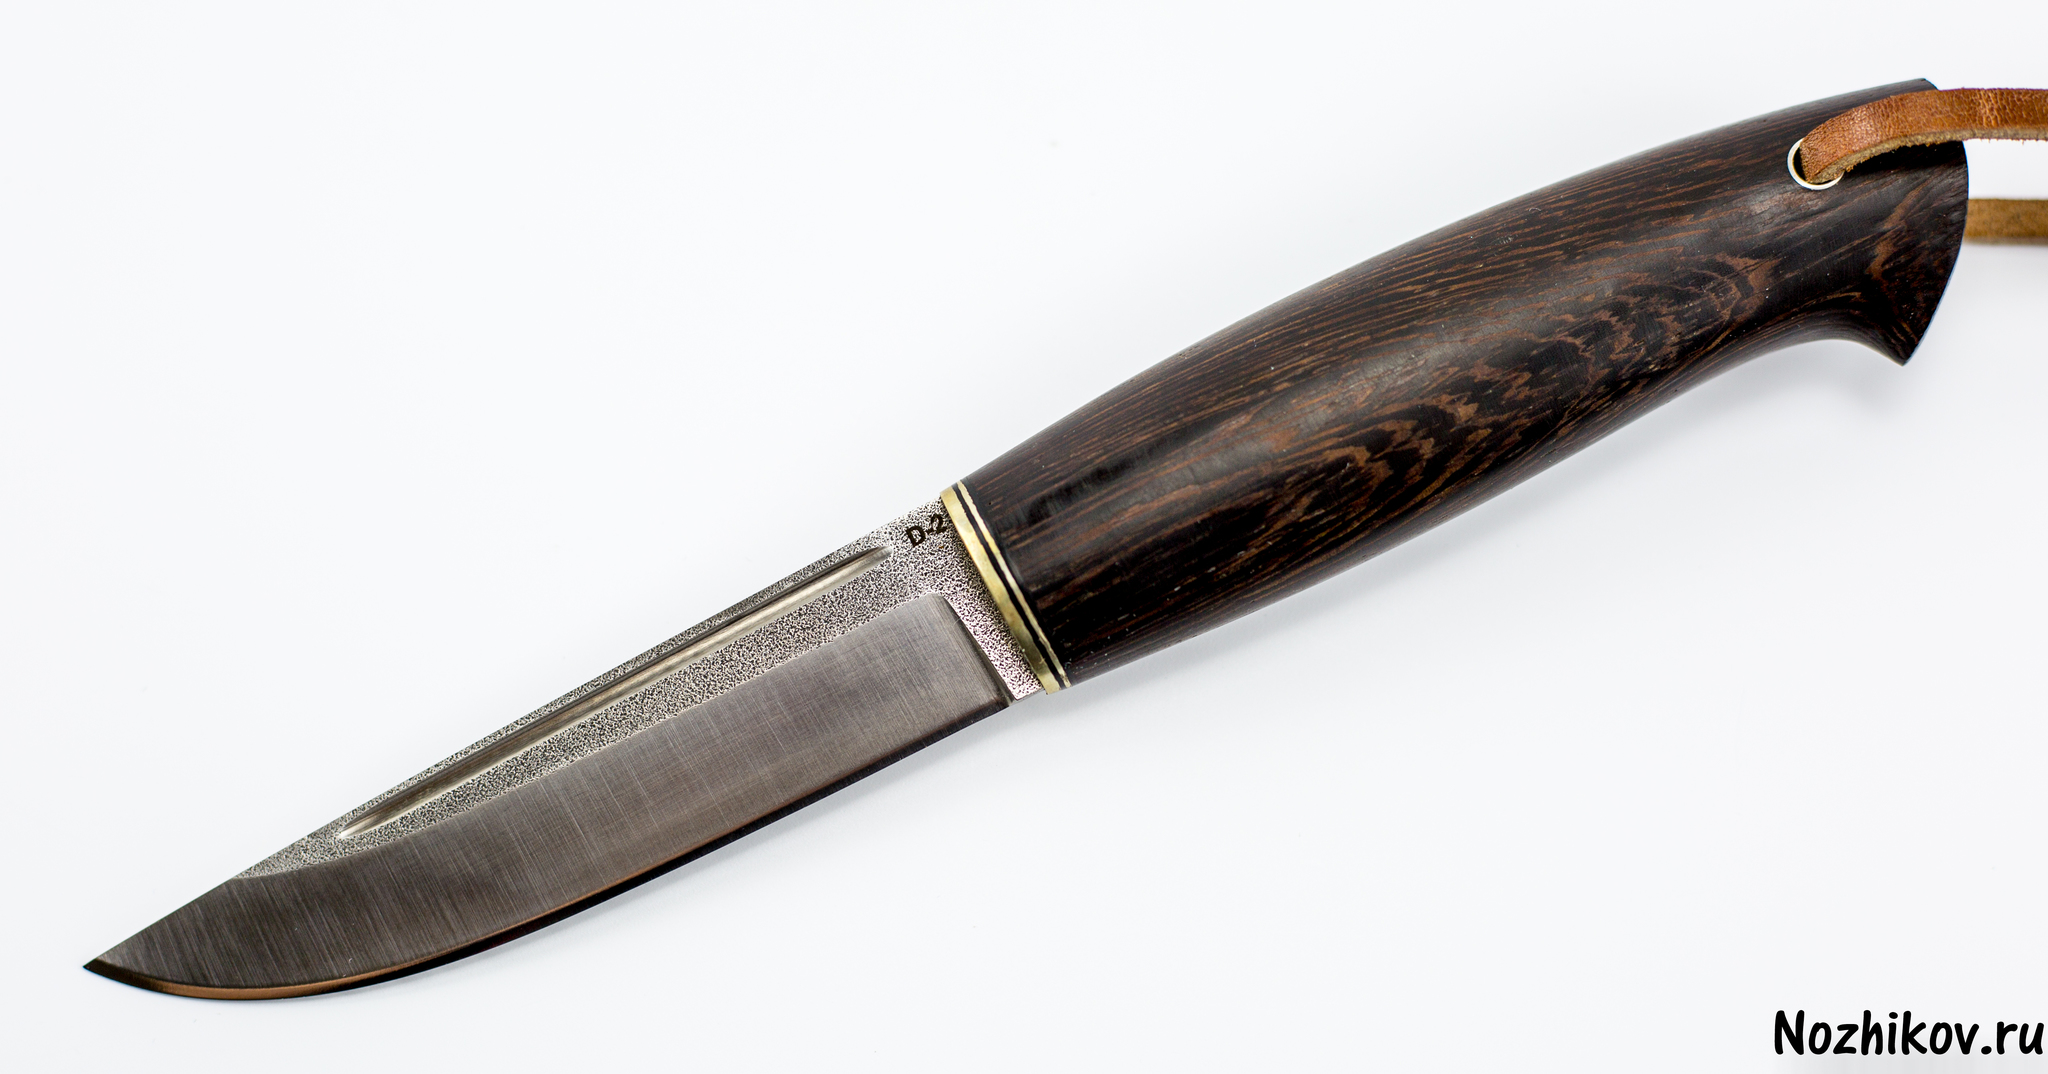 Нож Барбус, сталь D2, венгеНожи Староминск<br>Нож Барбус, сталь D2, венге<br>